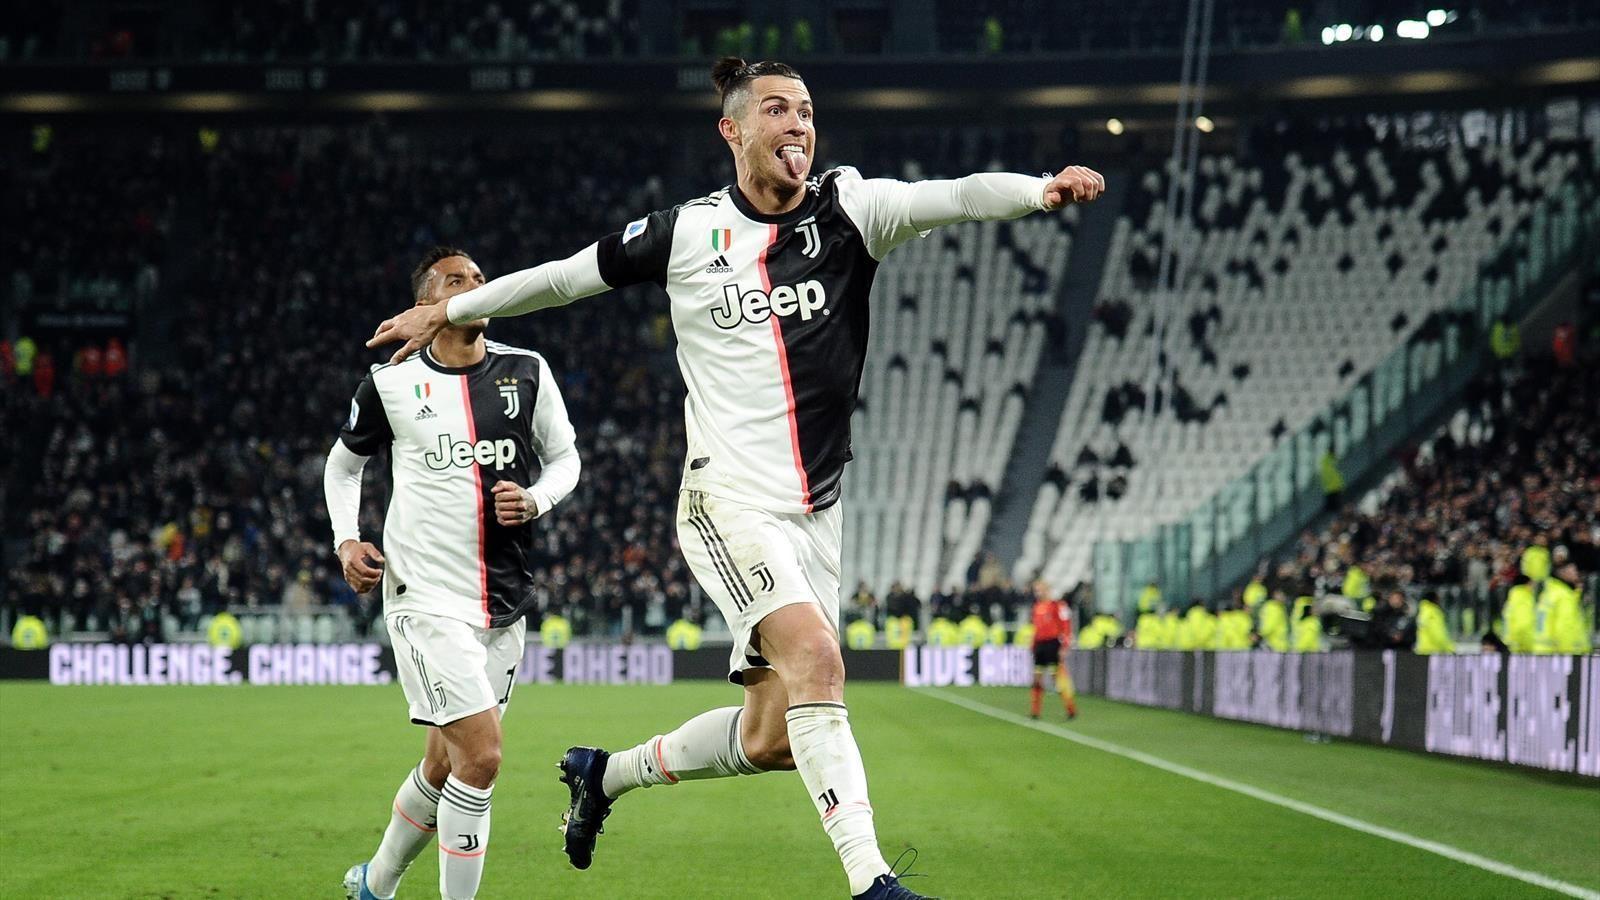 [44+] Cristiano Ronaldo HD 2020 Wallpapers on WallpaperSafari